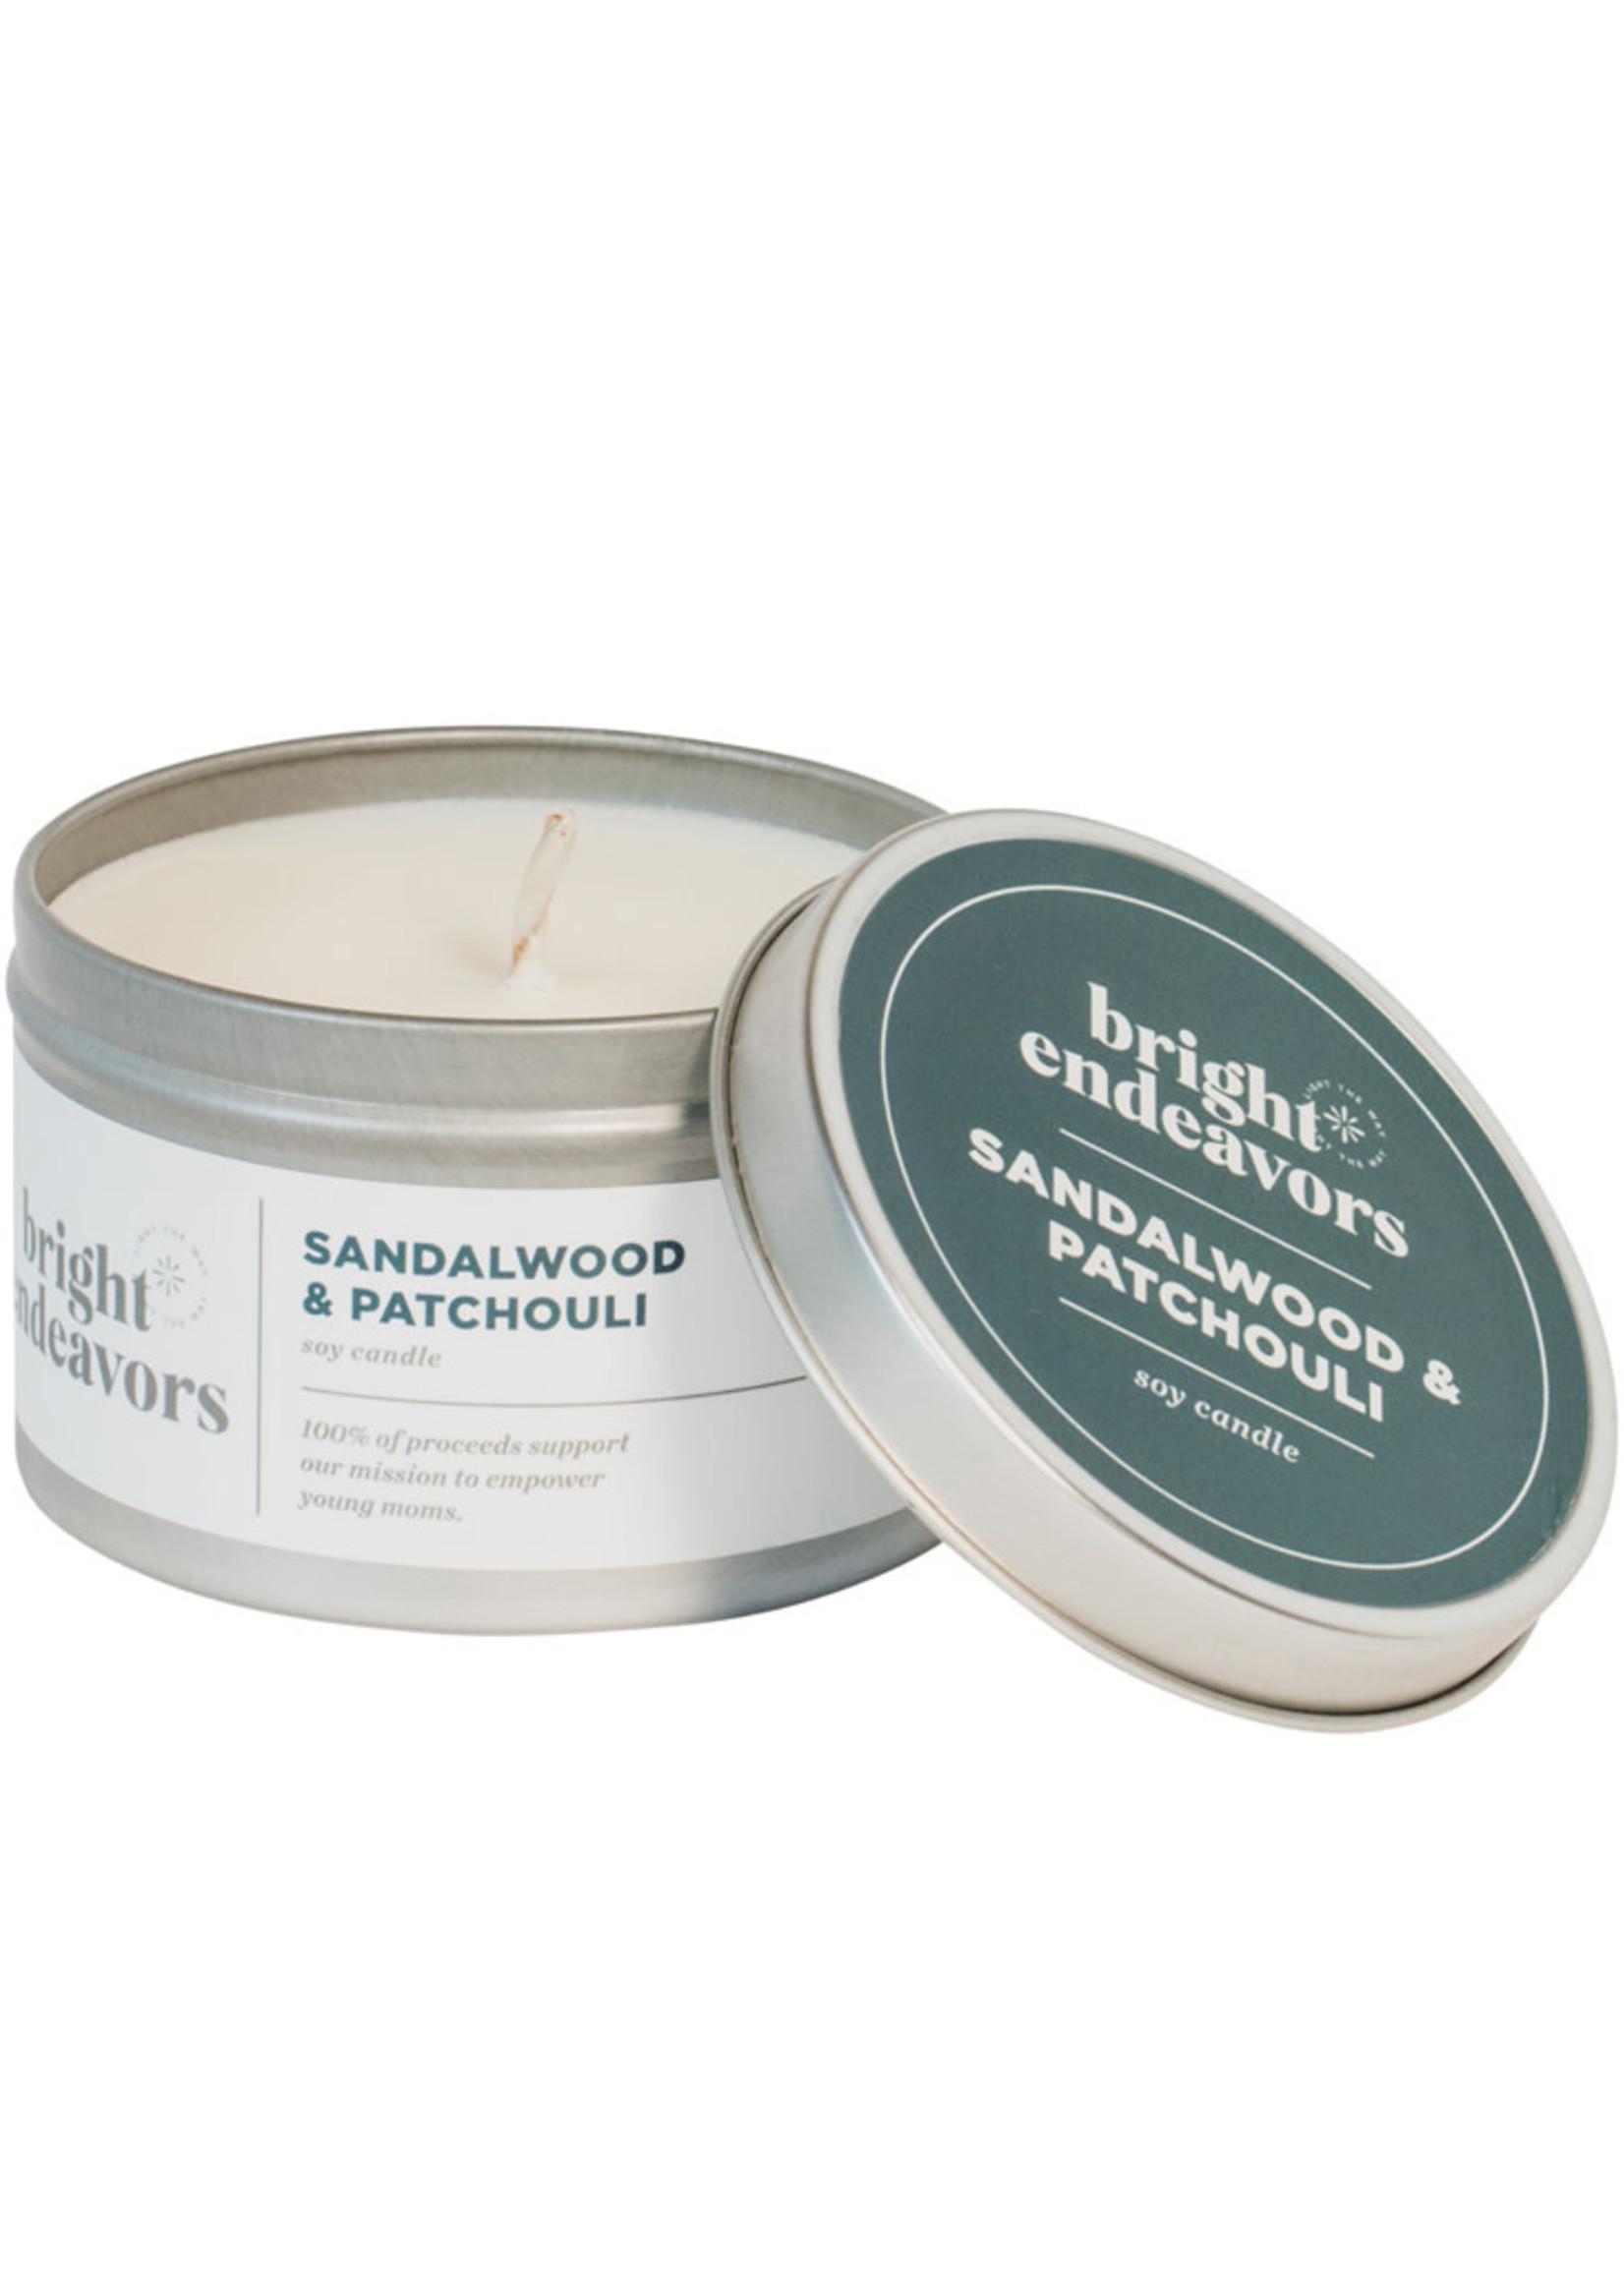 Bright Endeavors Sandalwood & Patchouli Soy Candle